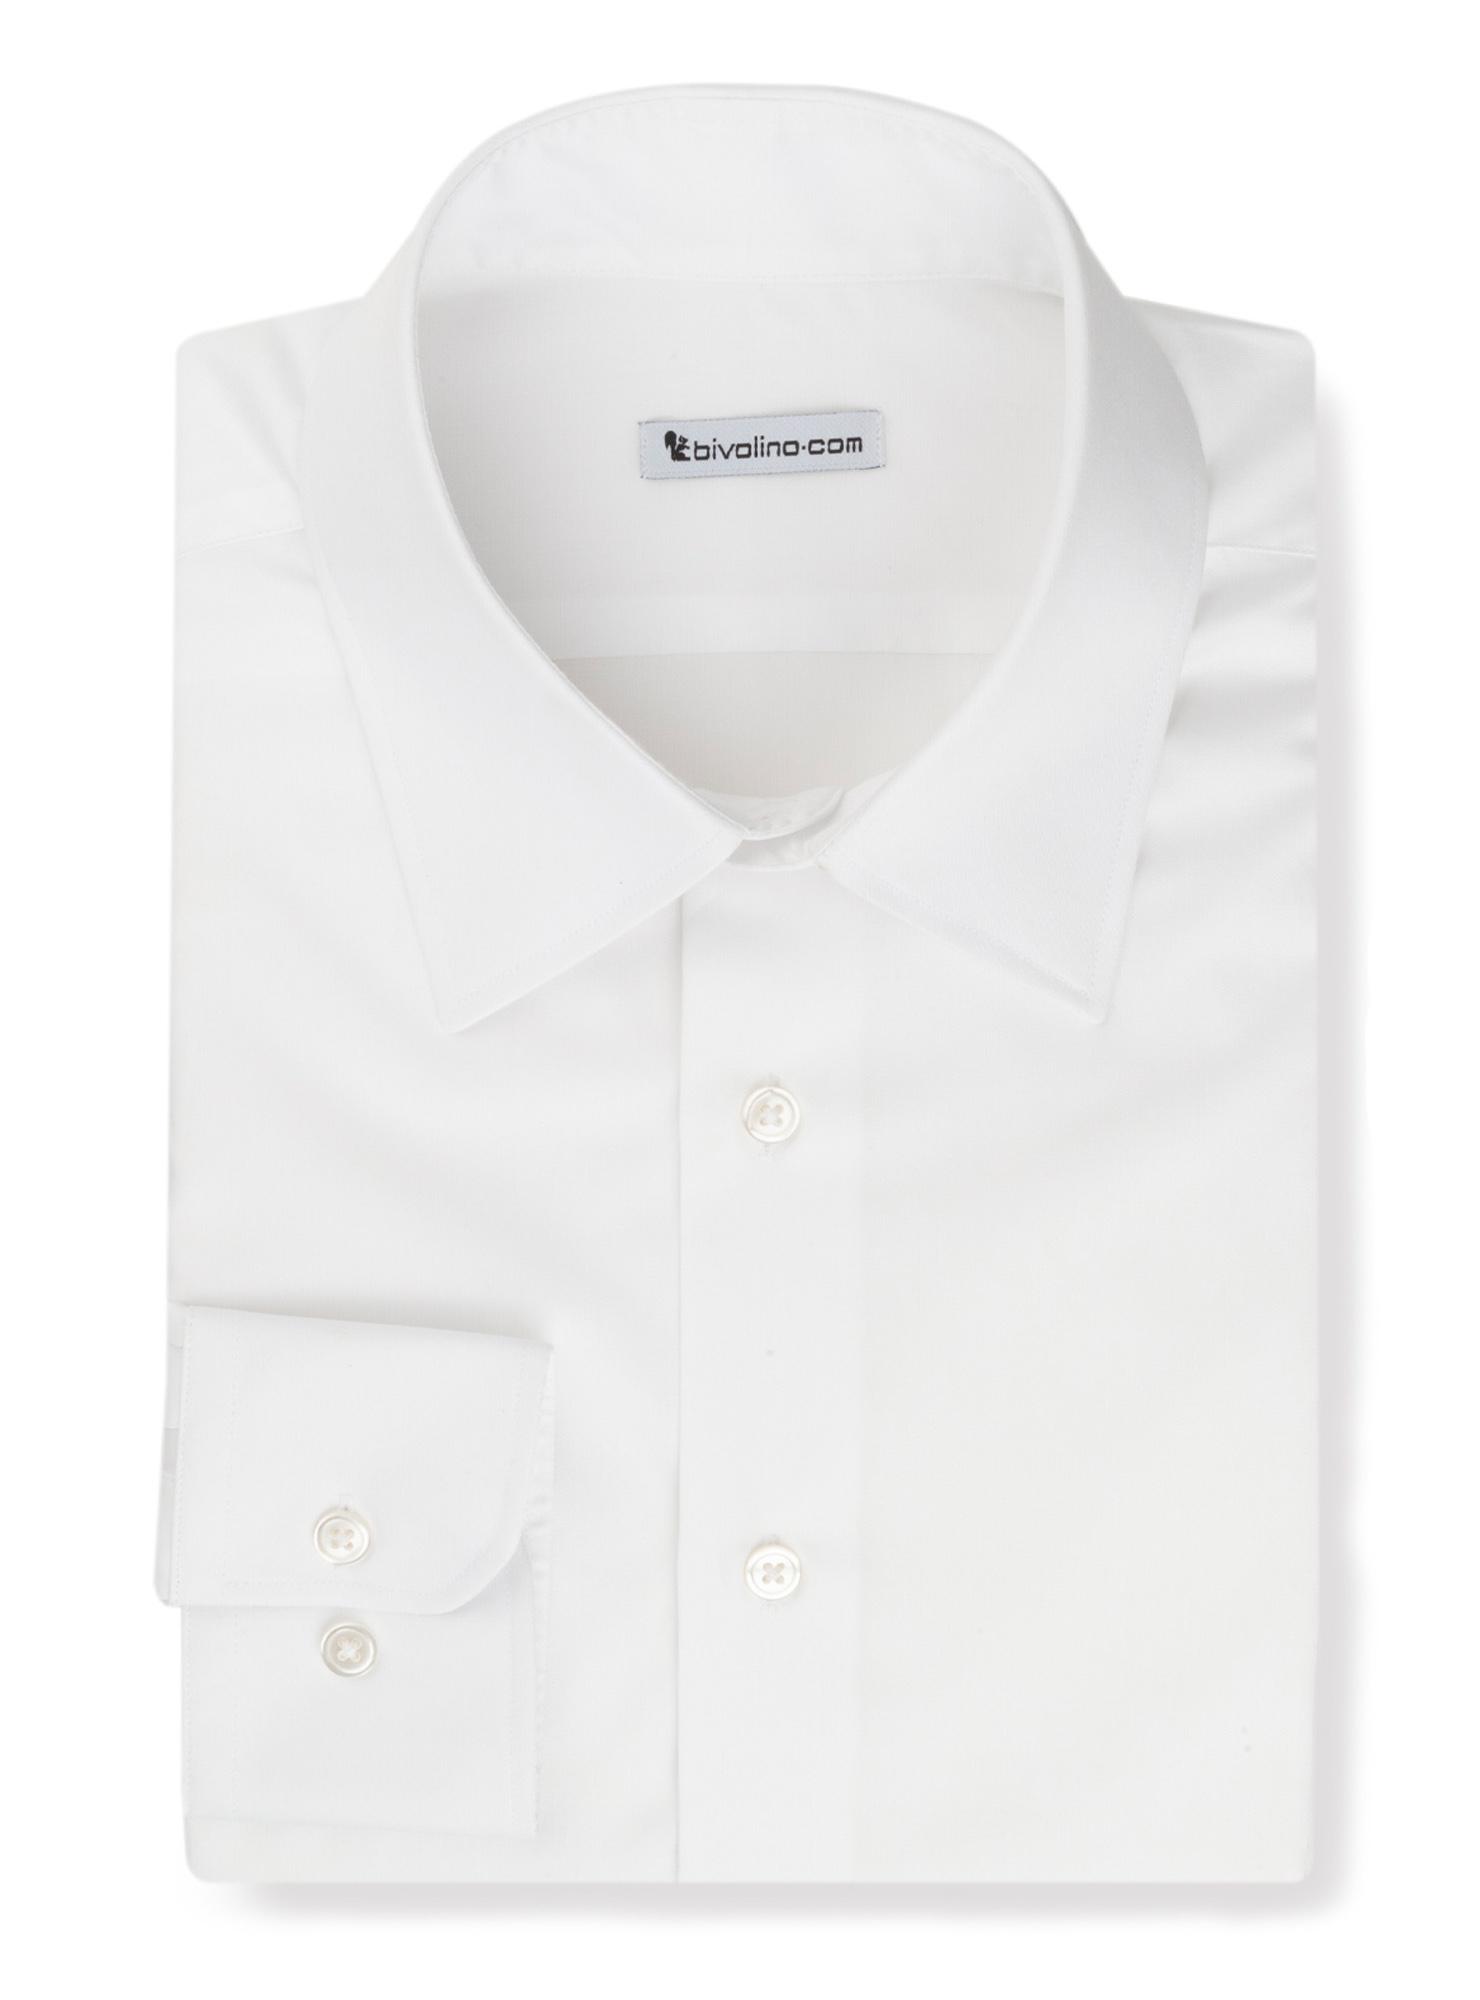 GABRIELAZI - White non-iron men shirt - Opal 1